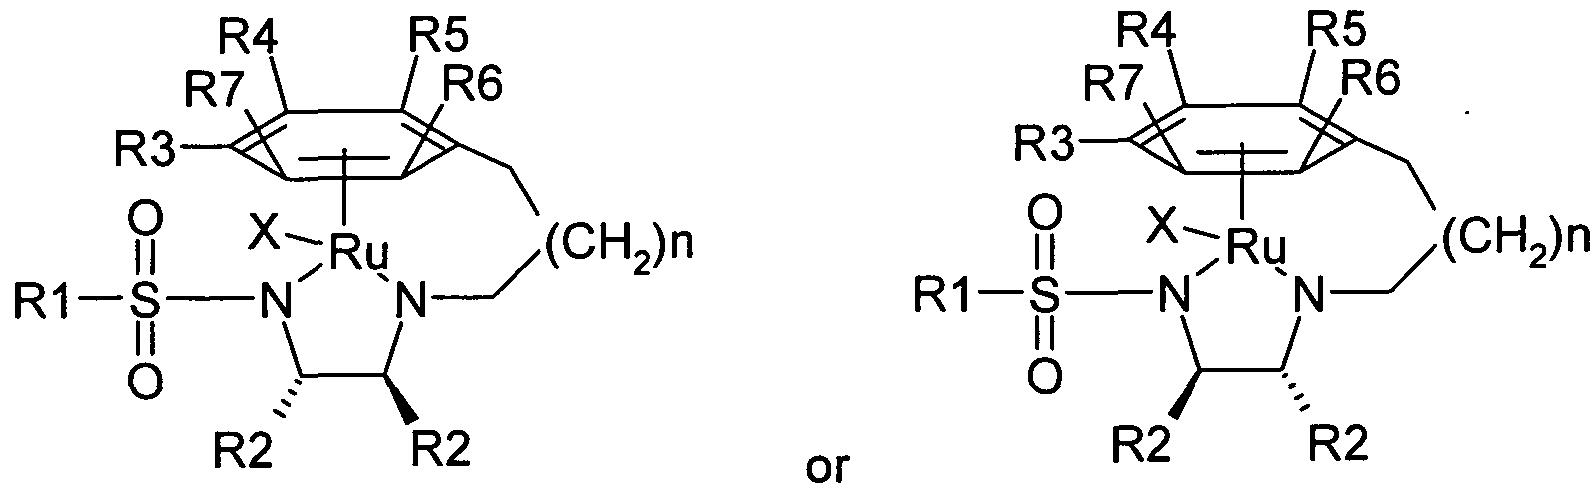 WO2011131315A1 - Process for the asymmetric transfer